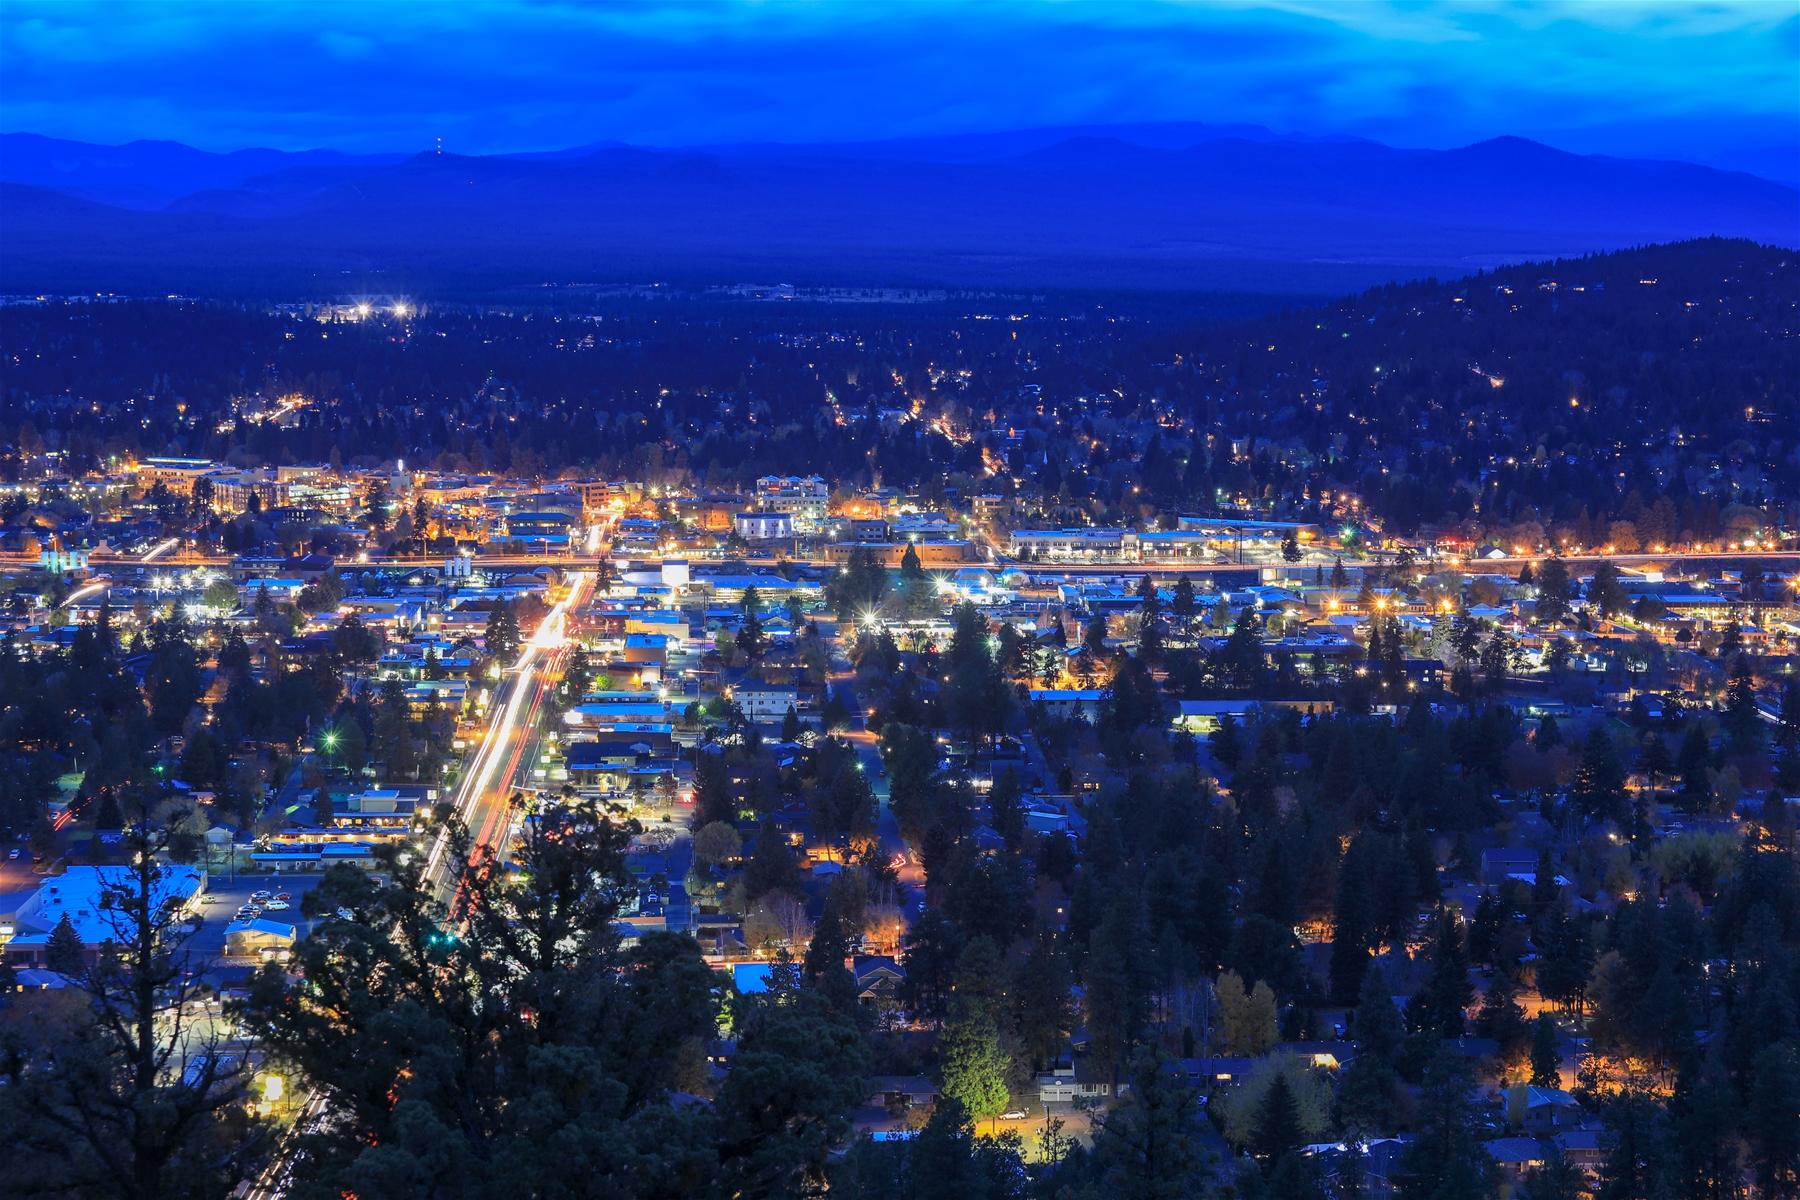 Bend Oregon city lights at night